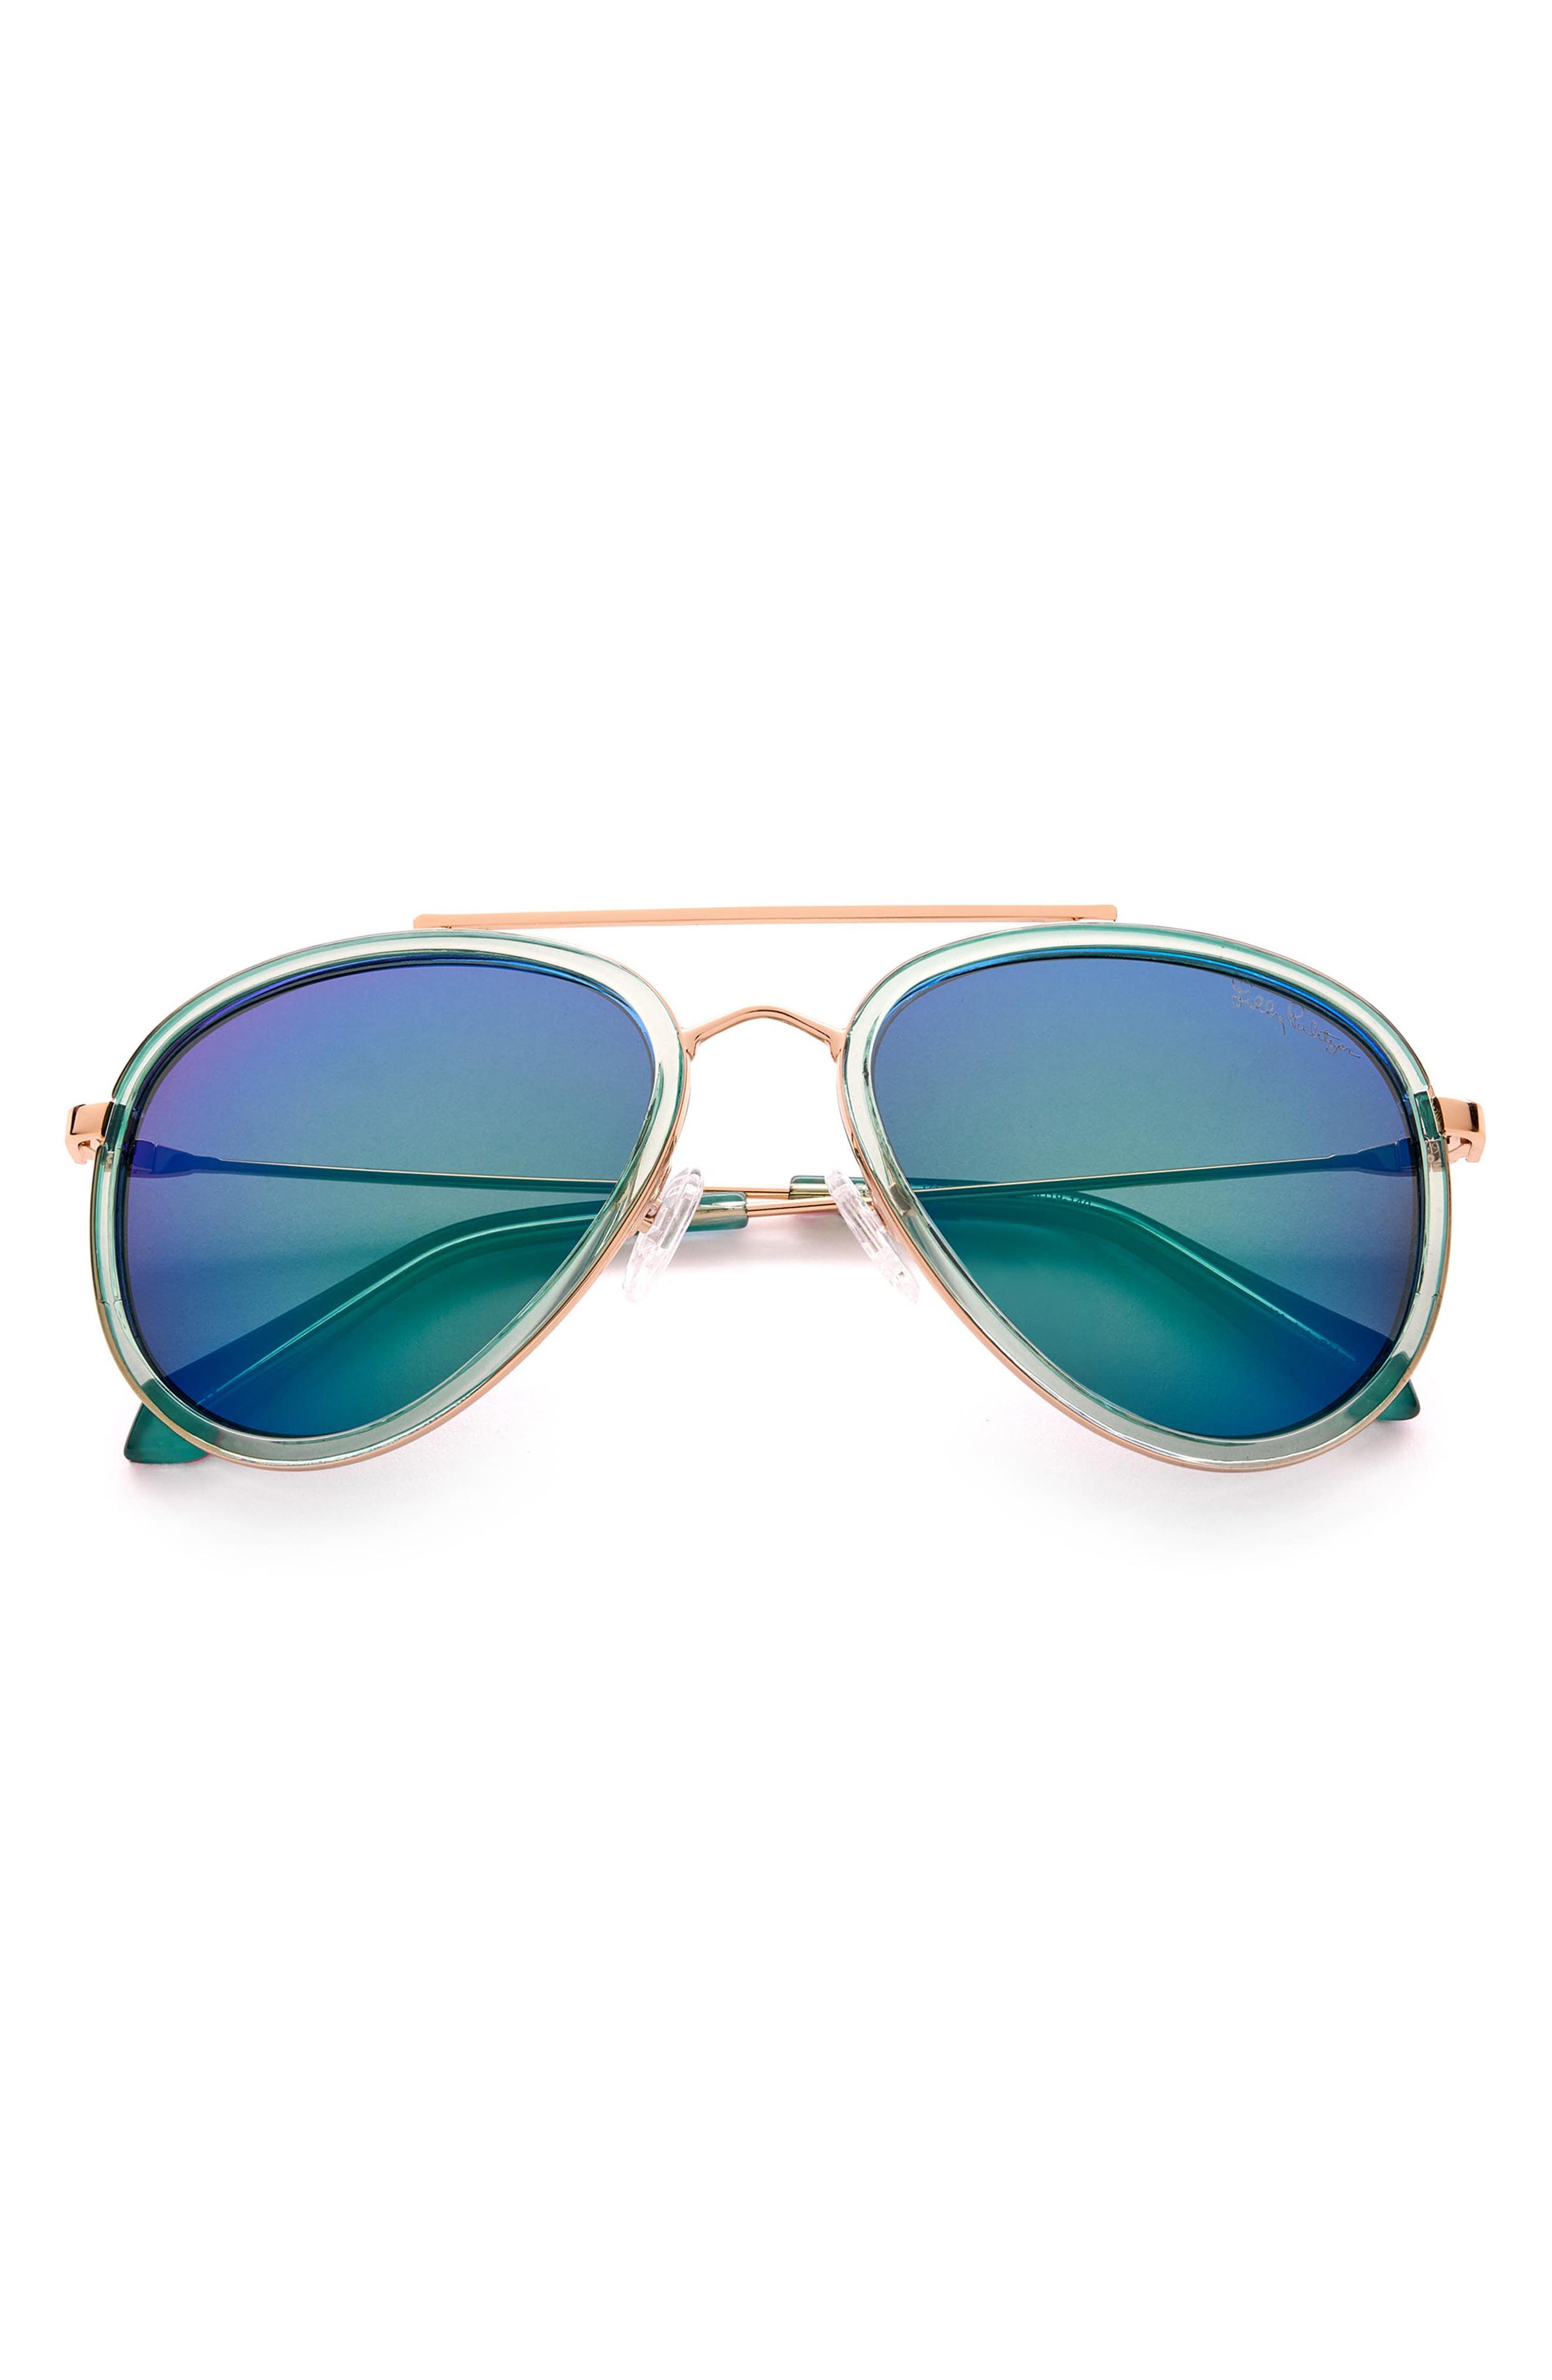 Women's Lilly Pulitzer 55mm Aviator Sunglasses